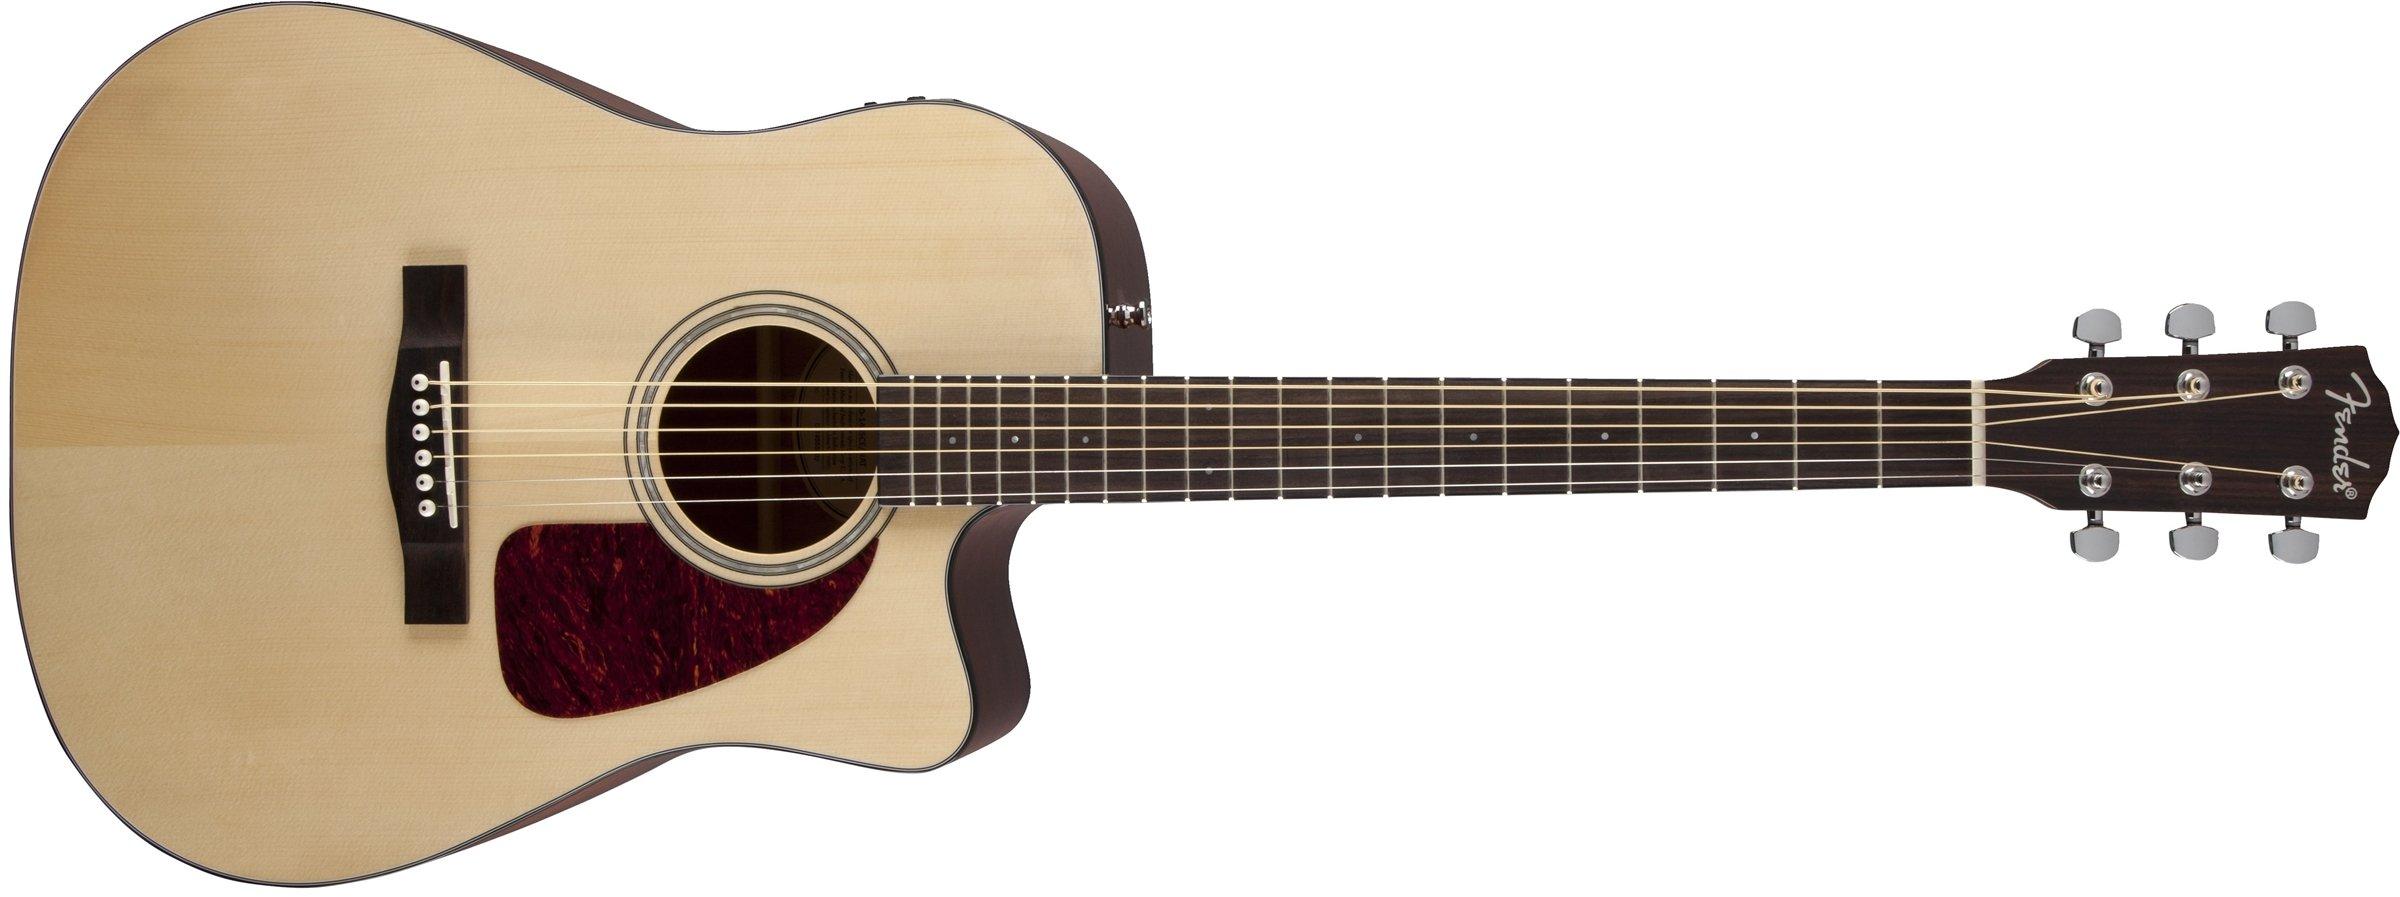 Fender Beginner Acoustic-Electric Guitar CD-140SCE - Natural - Dreadnought - Cutaway